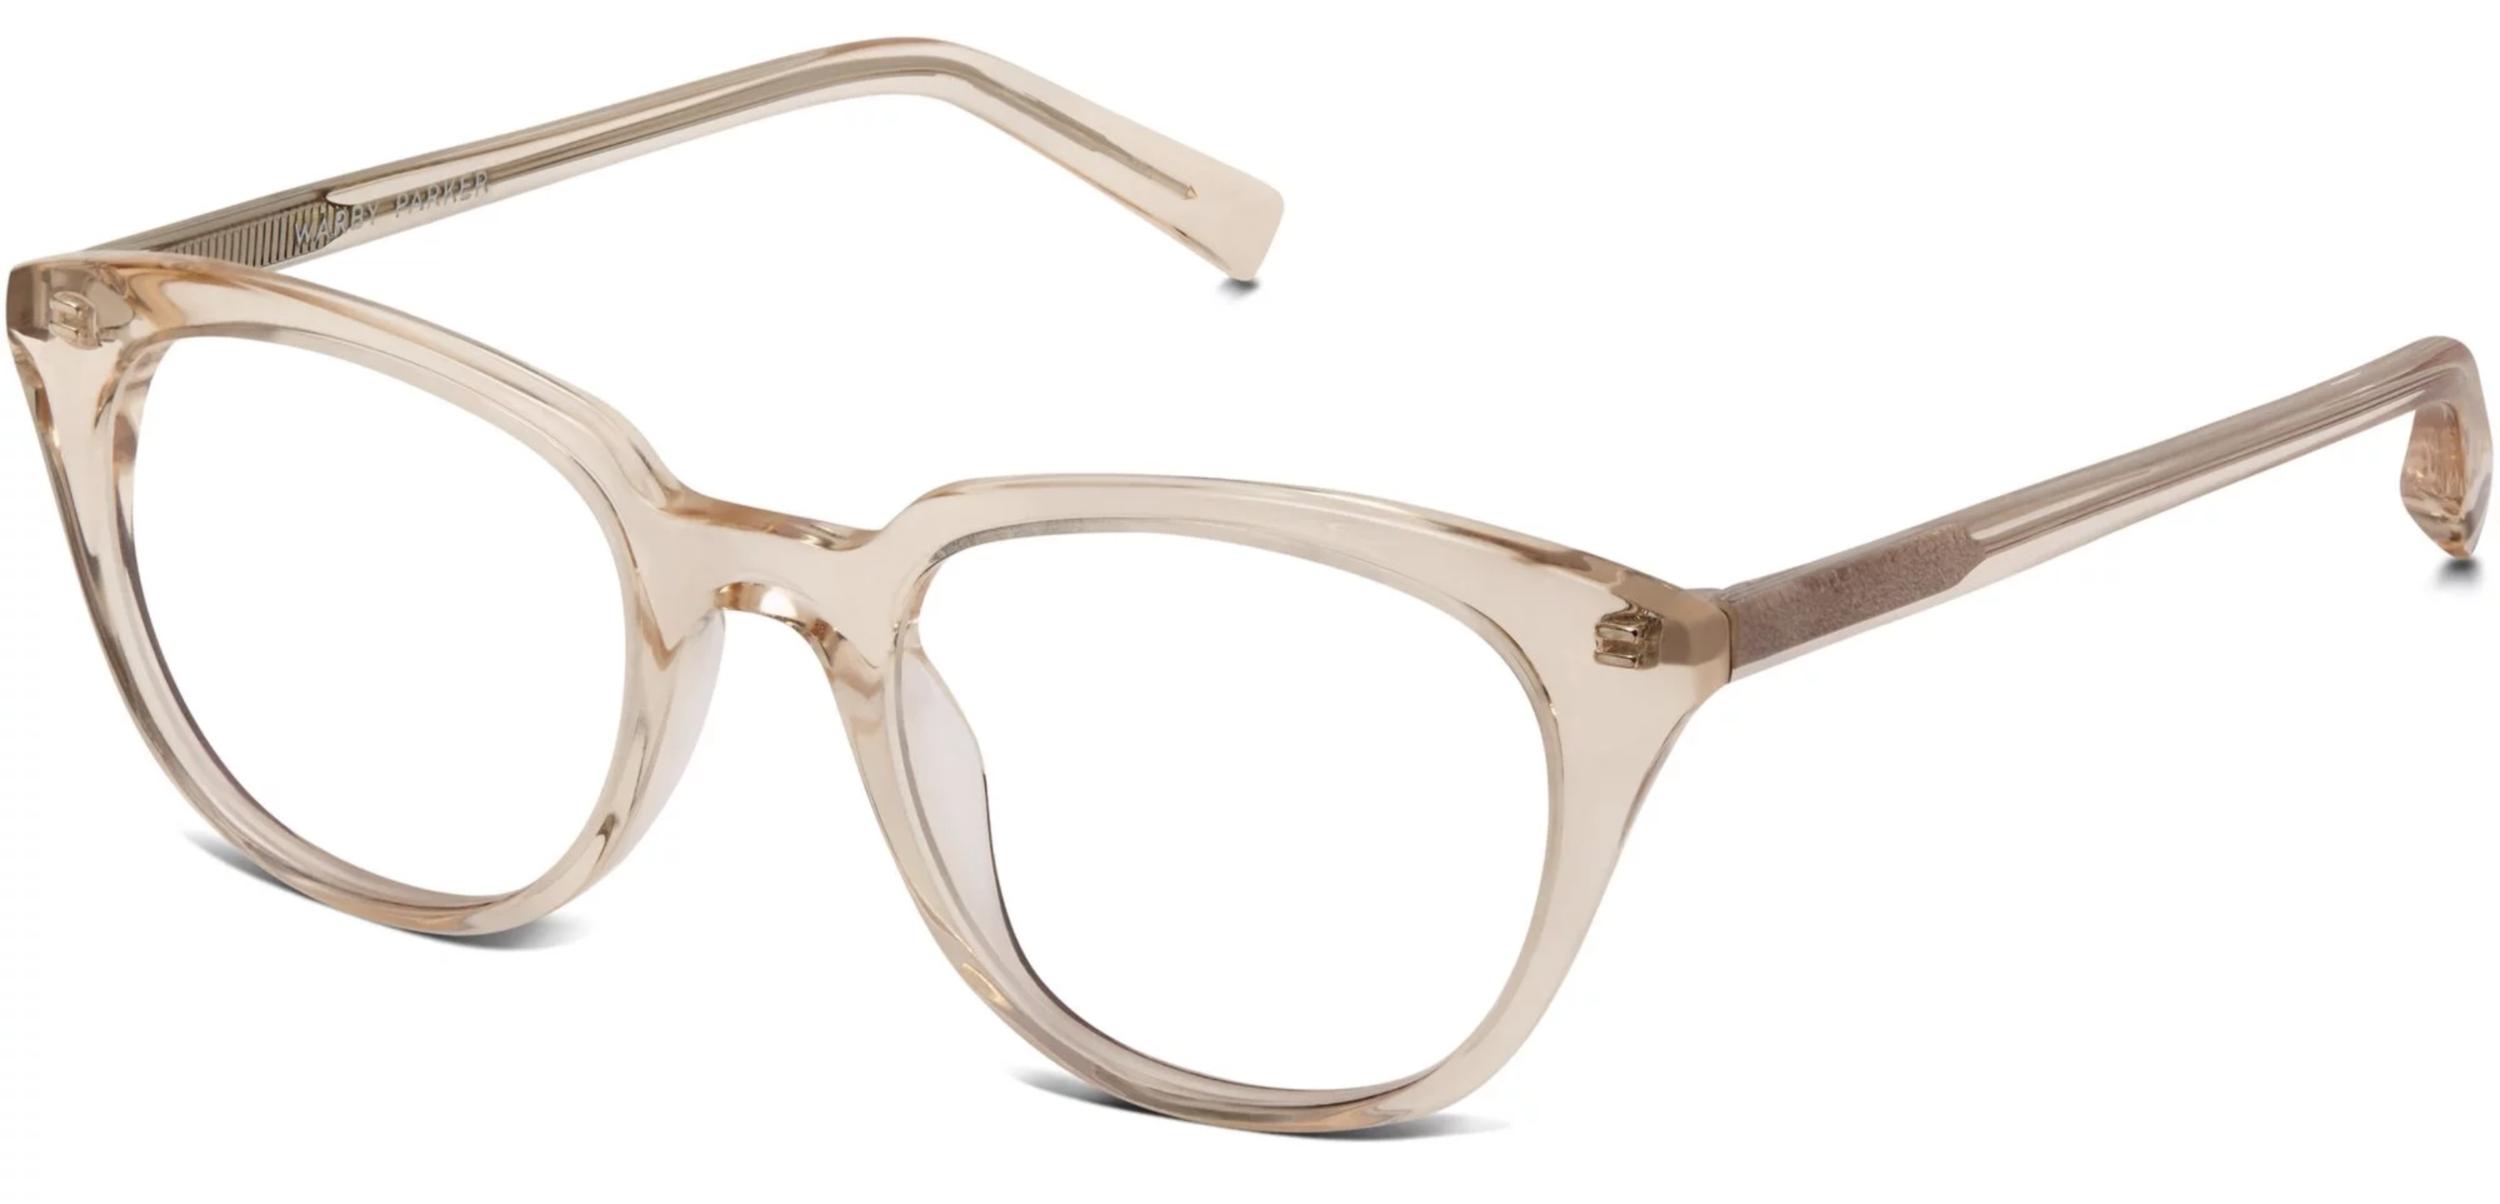 Warby Parker Chelsea Grapefruit Soda glasses